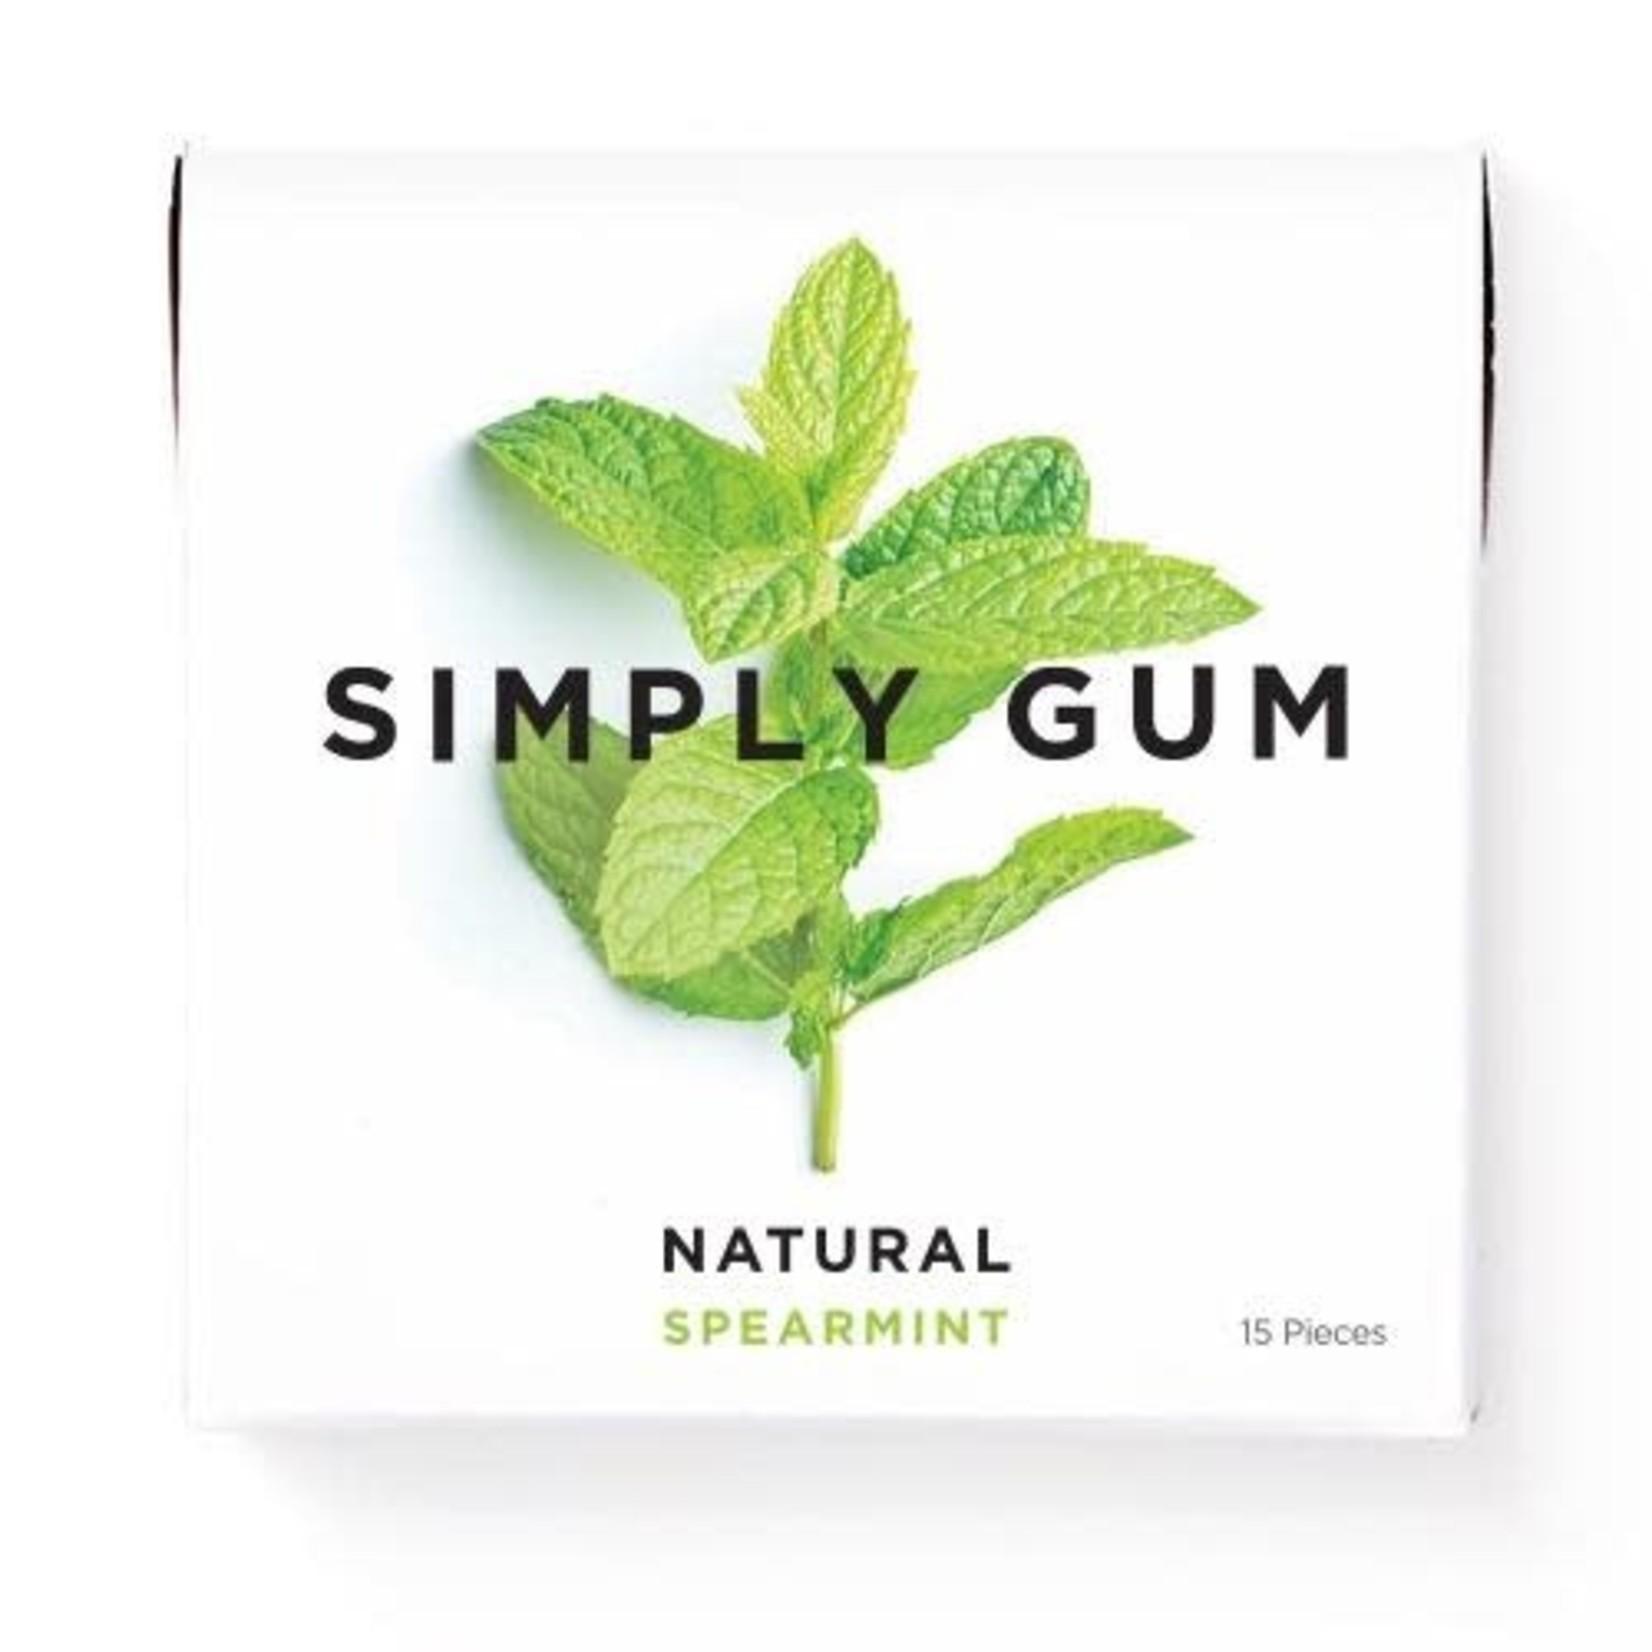 SIMPLY GUM SPEARMINT GUM